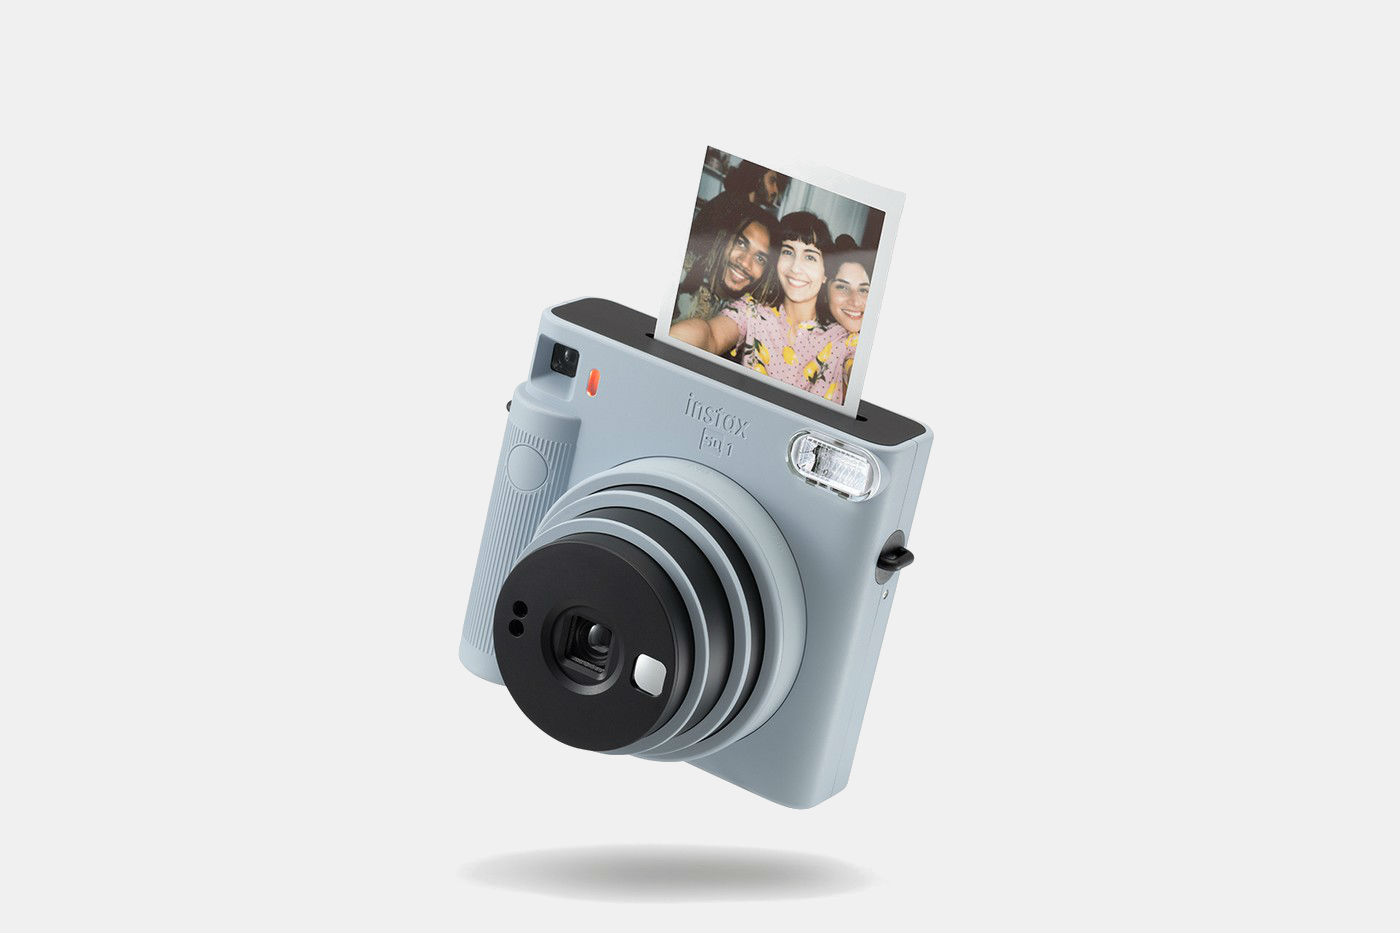 Фото: Новая камера Fujifilm instax Square SQ1 — мечта для минималистов